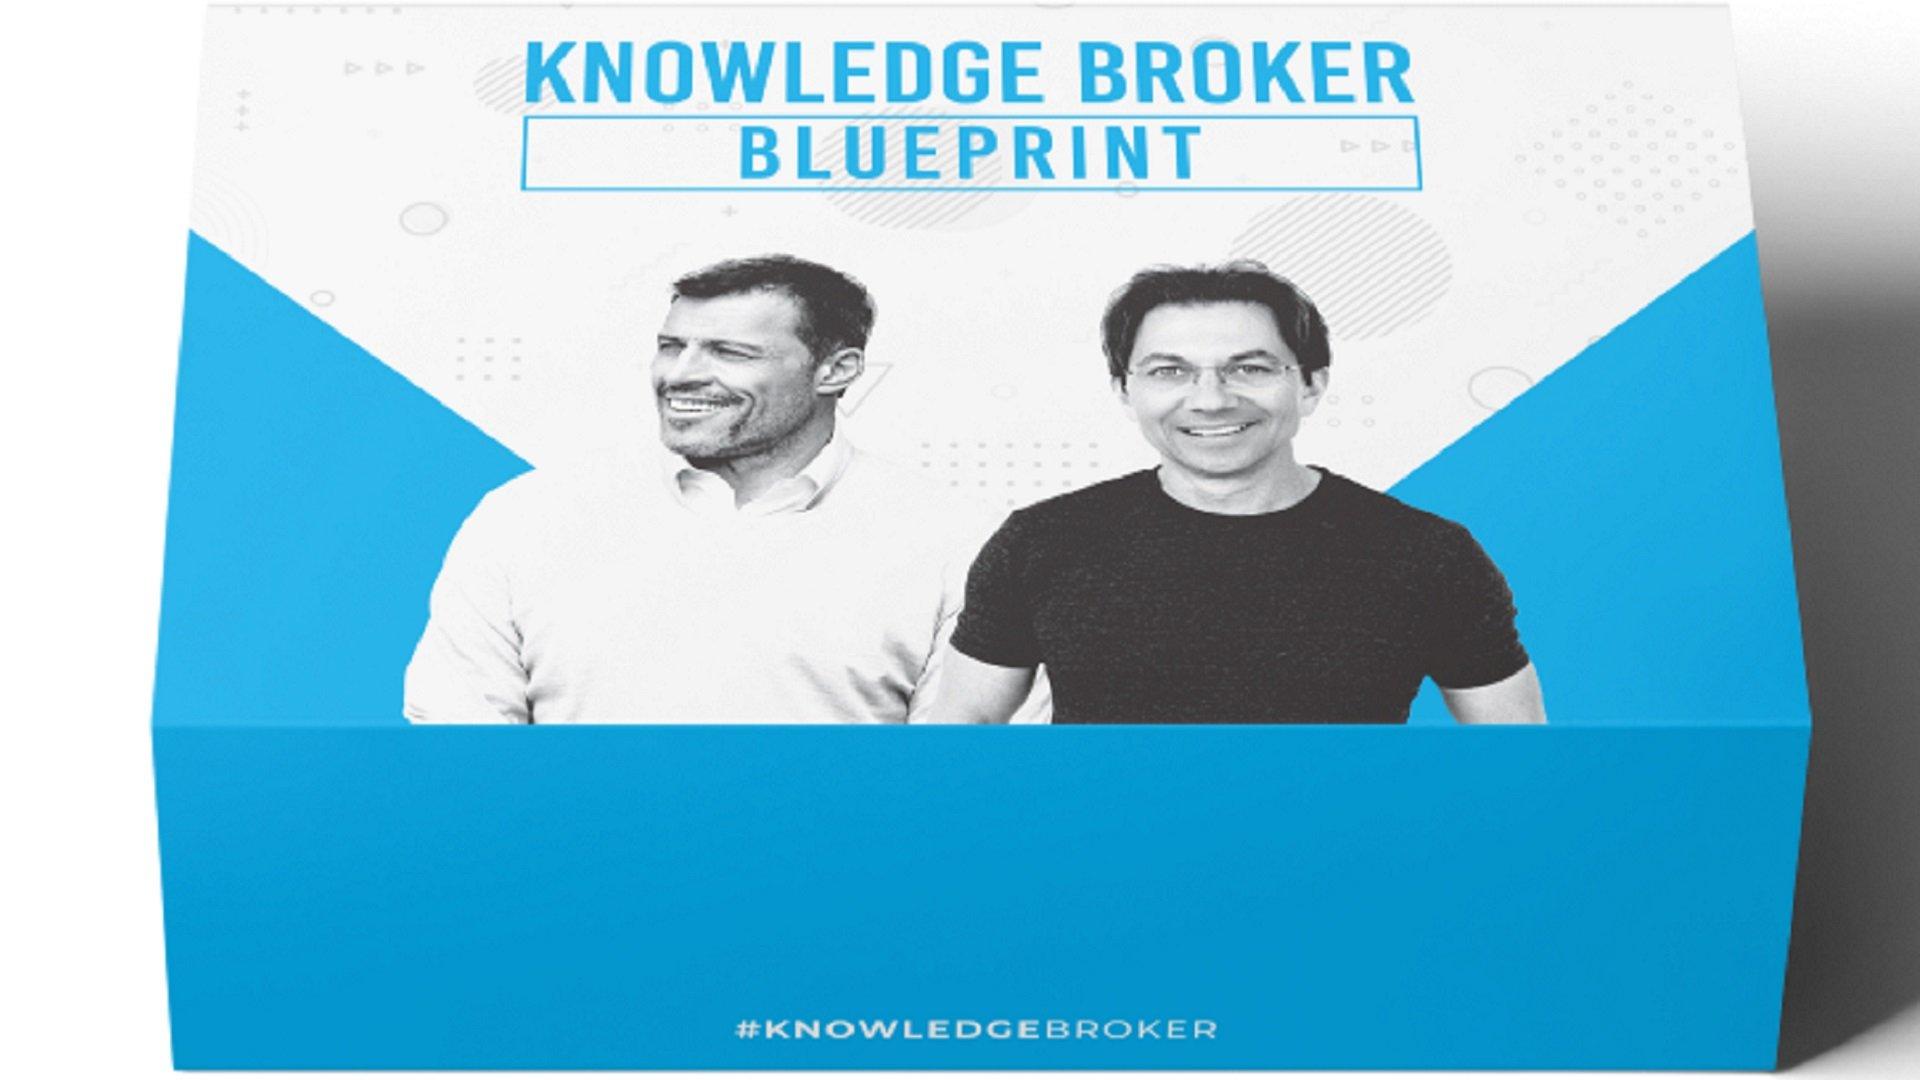 KBB Course Bonus: Start Fast Welcome Box - Knowledge Broker Blueprint